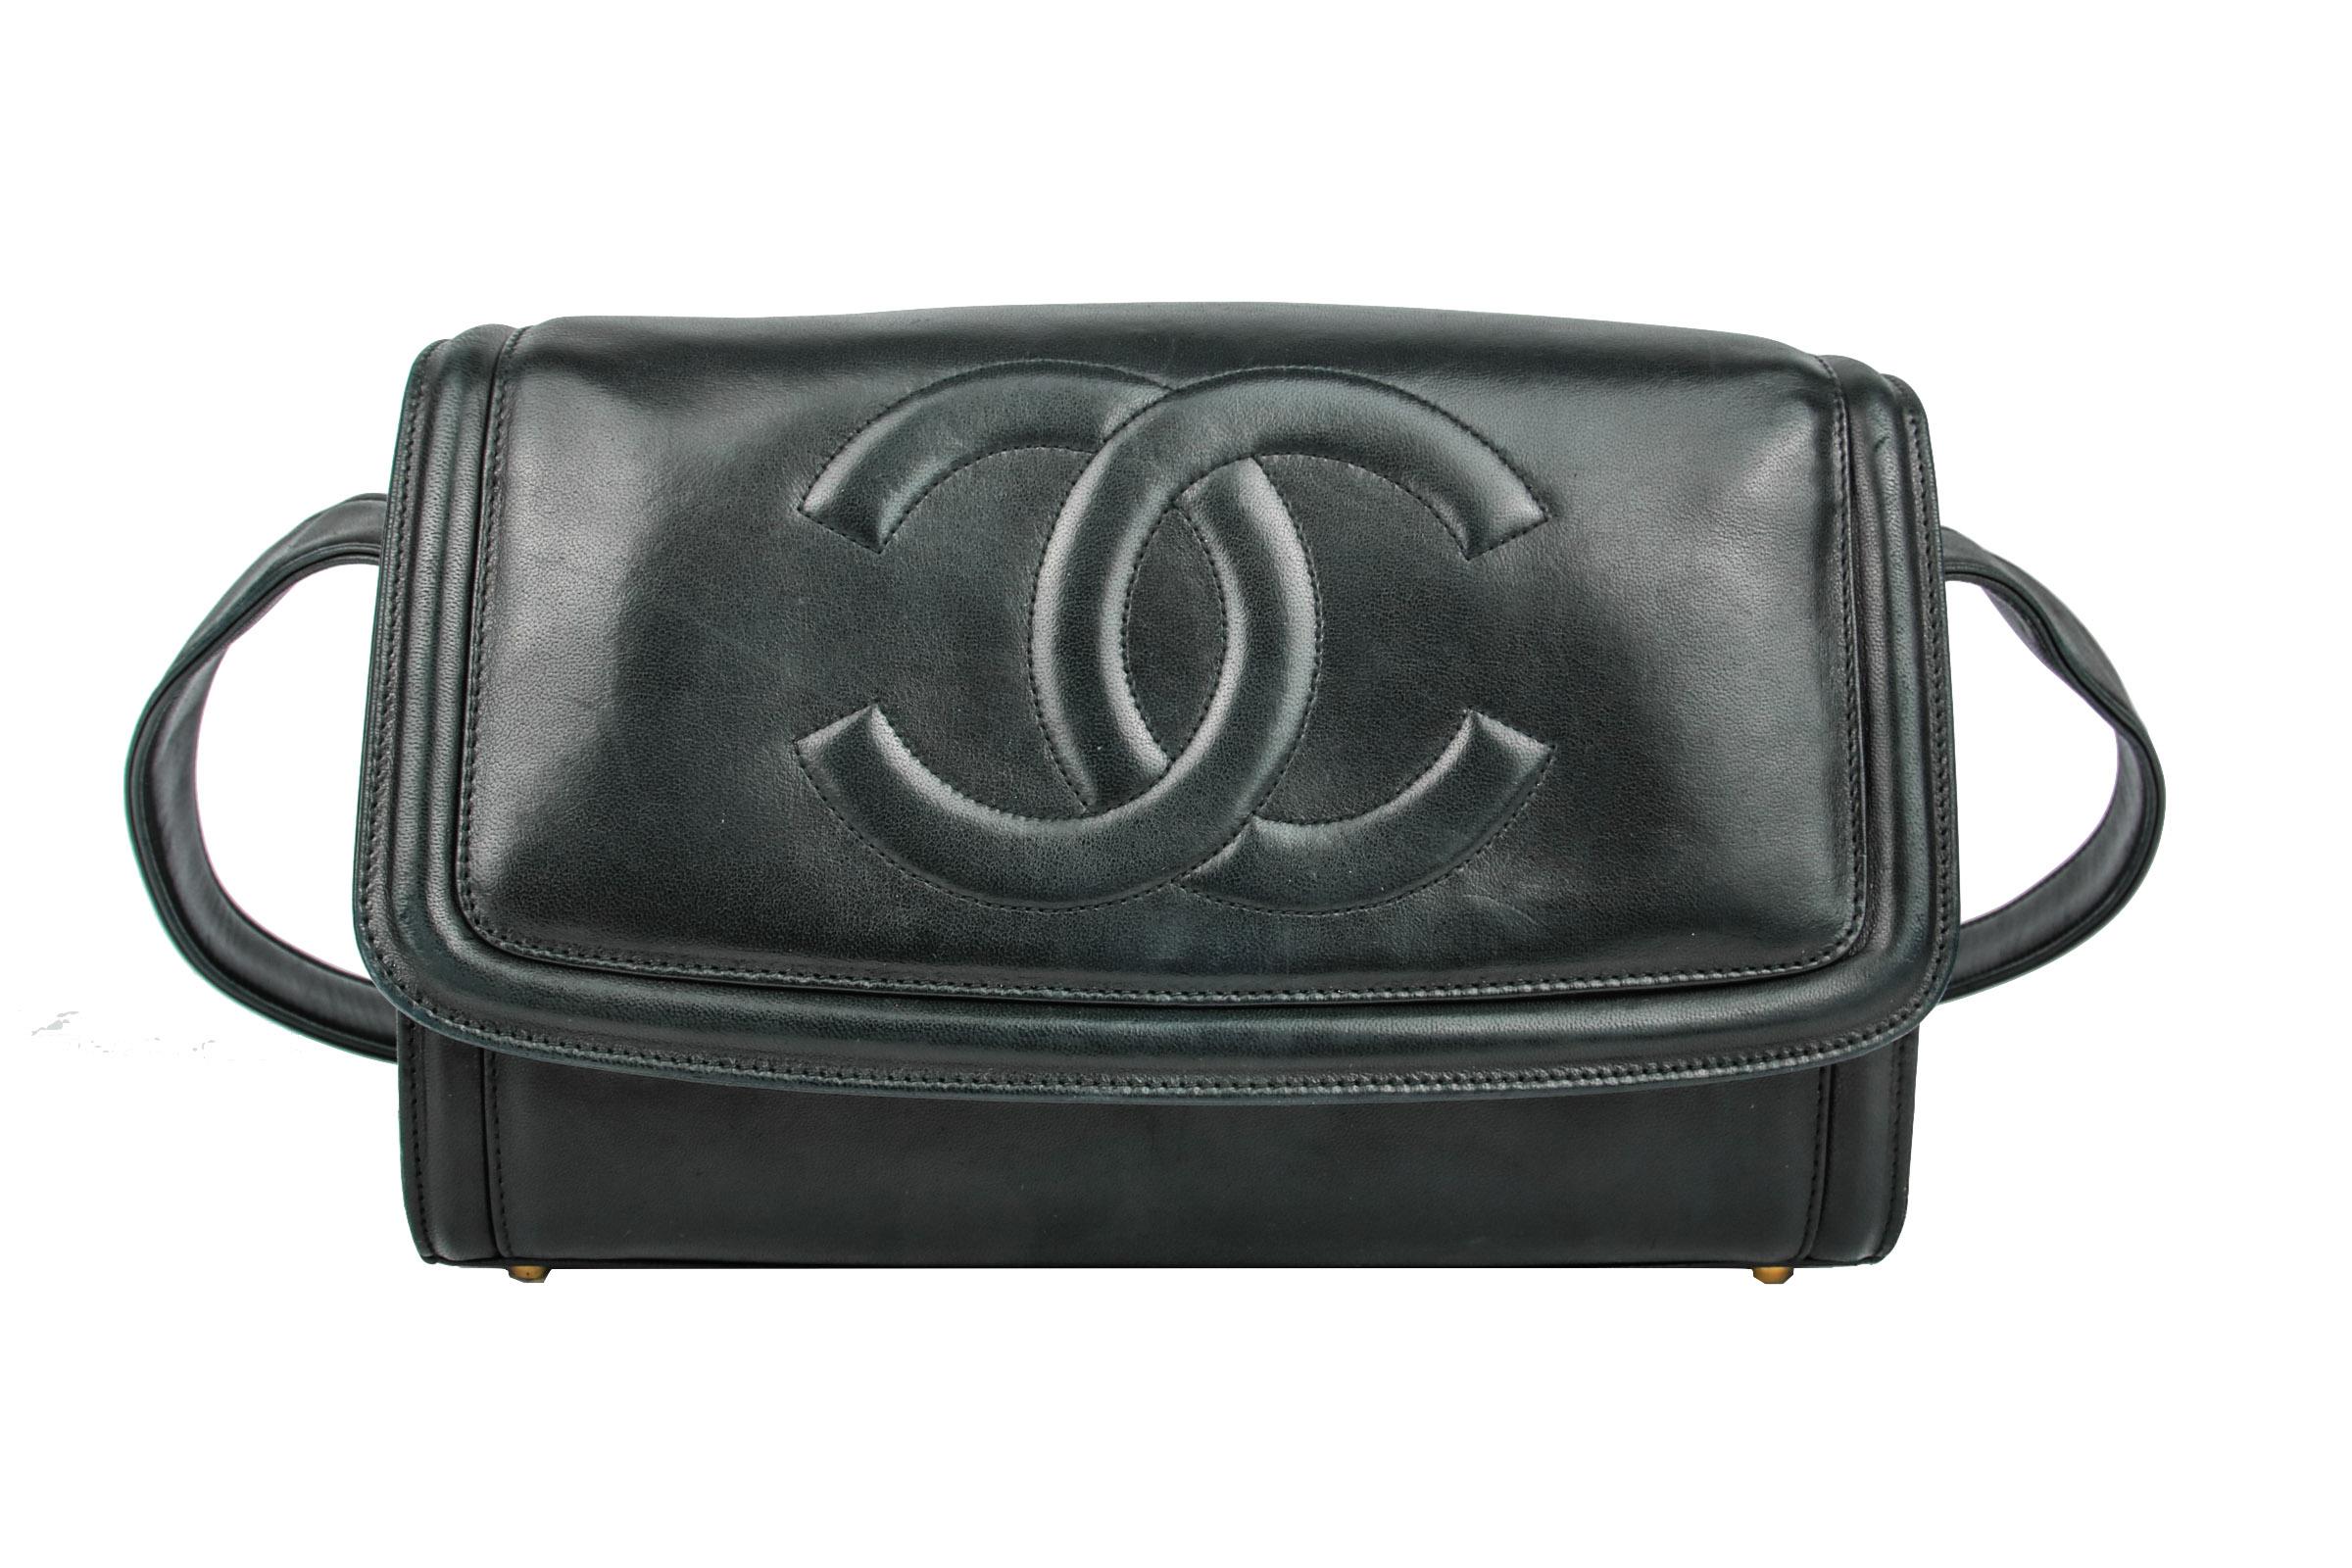 22df4f4a6ec2a Chanel Handtaschen   Accessoires